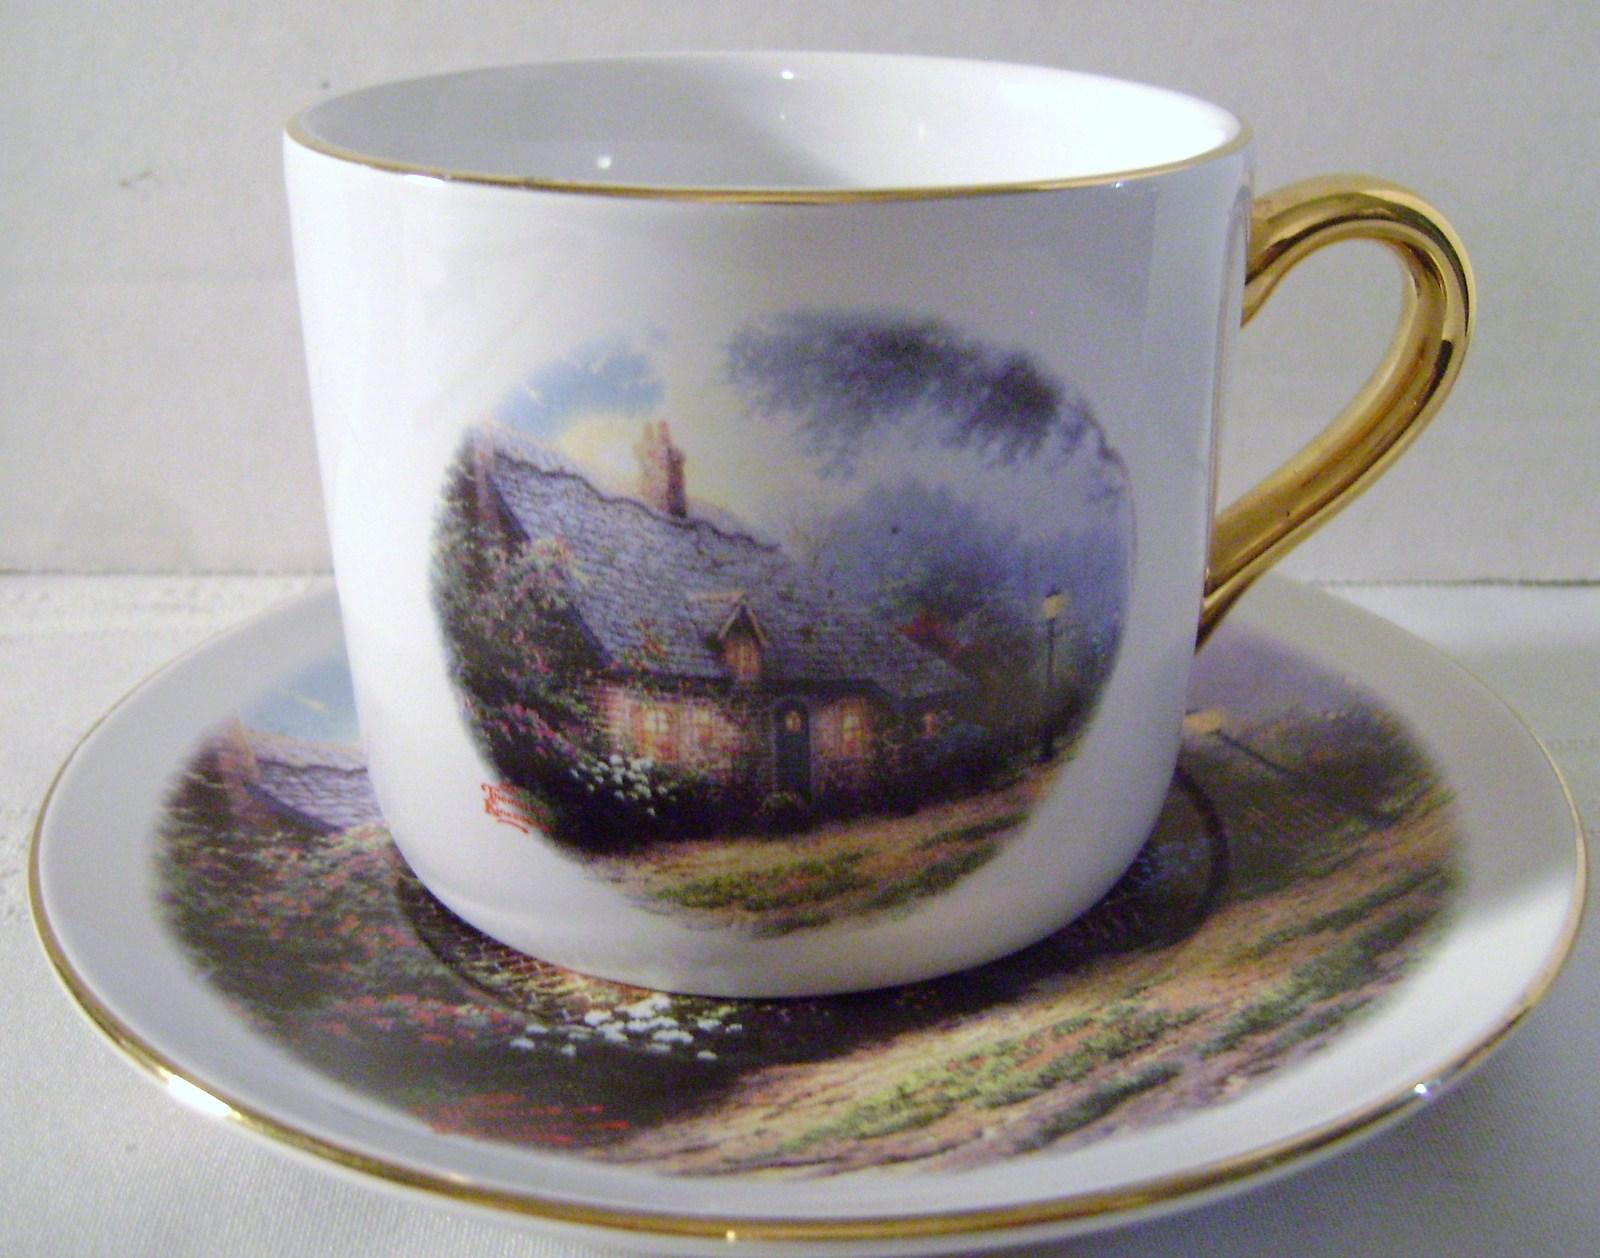 Thomas Kinkade Moonlight Cottage Cup & Saucer Set - $15.00